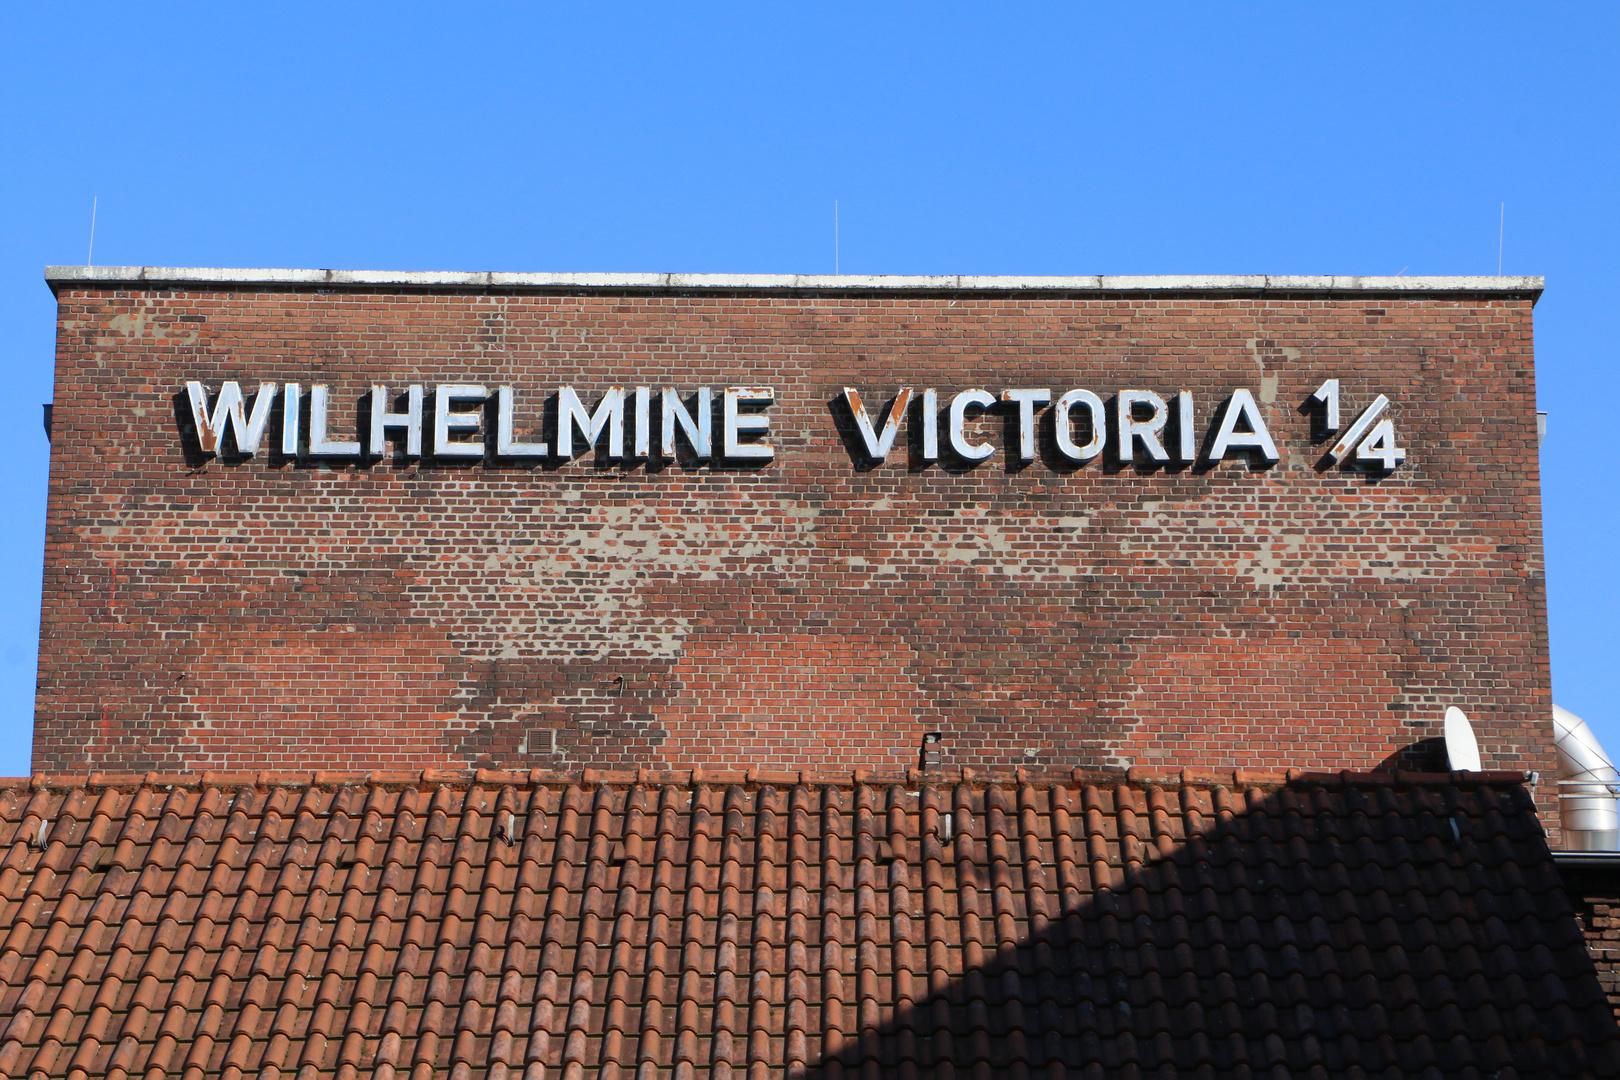 Wilhelmine Victoria Kaue